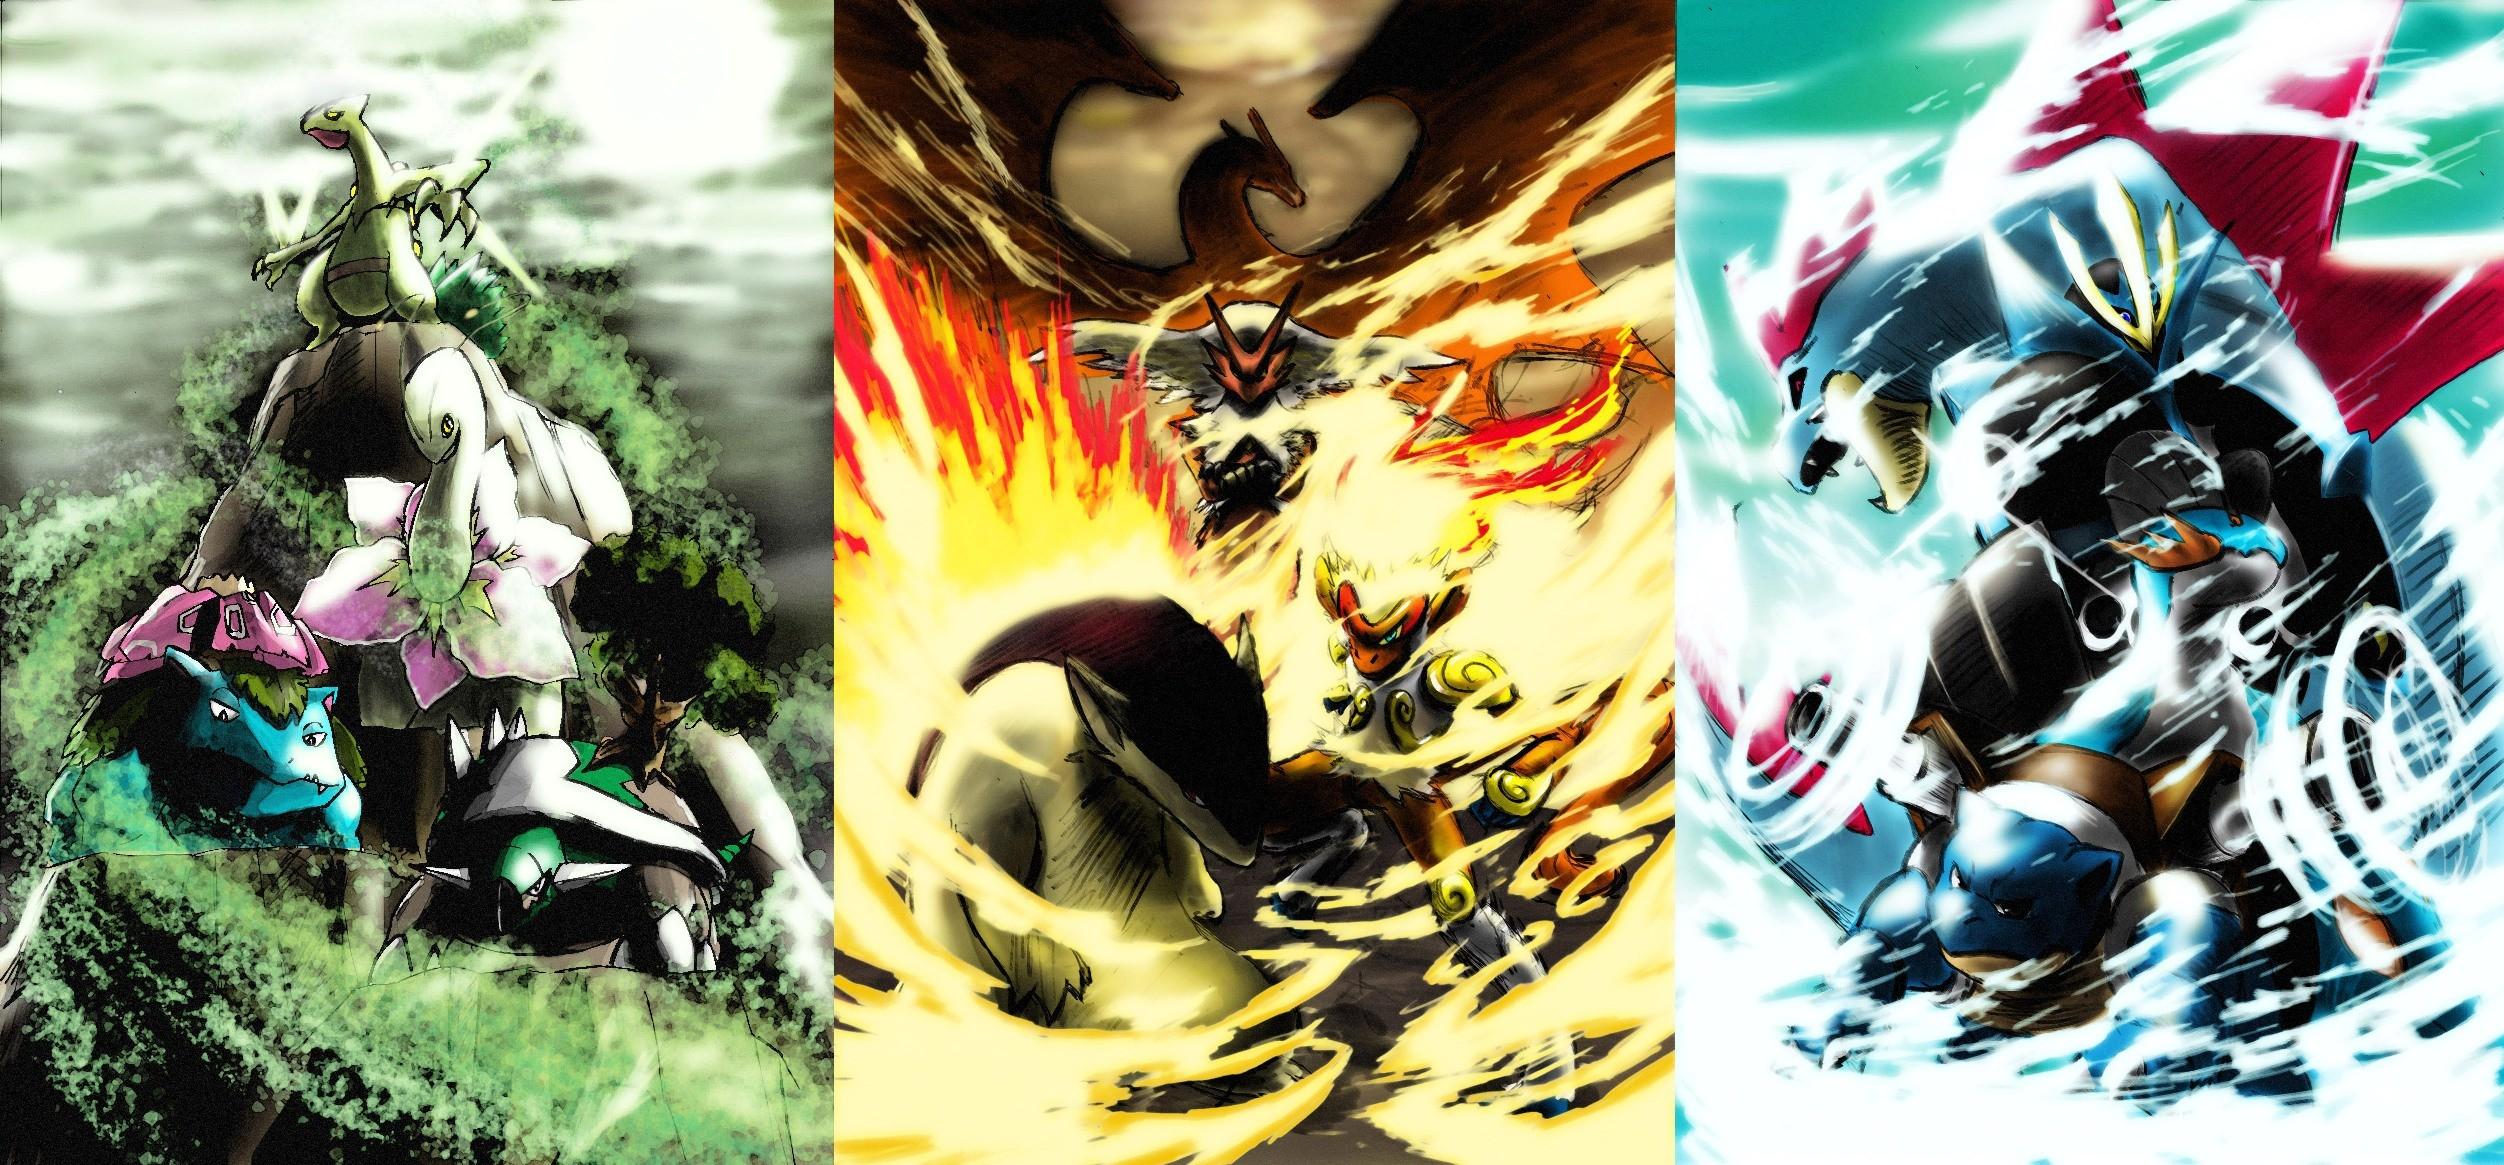 HD Wallpaper   Background ID:119279. Anime Pokémon